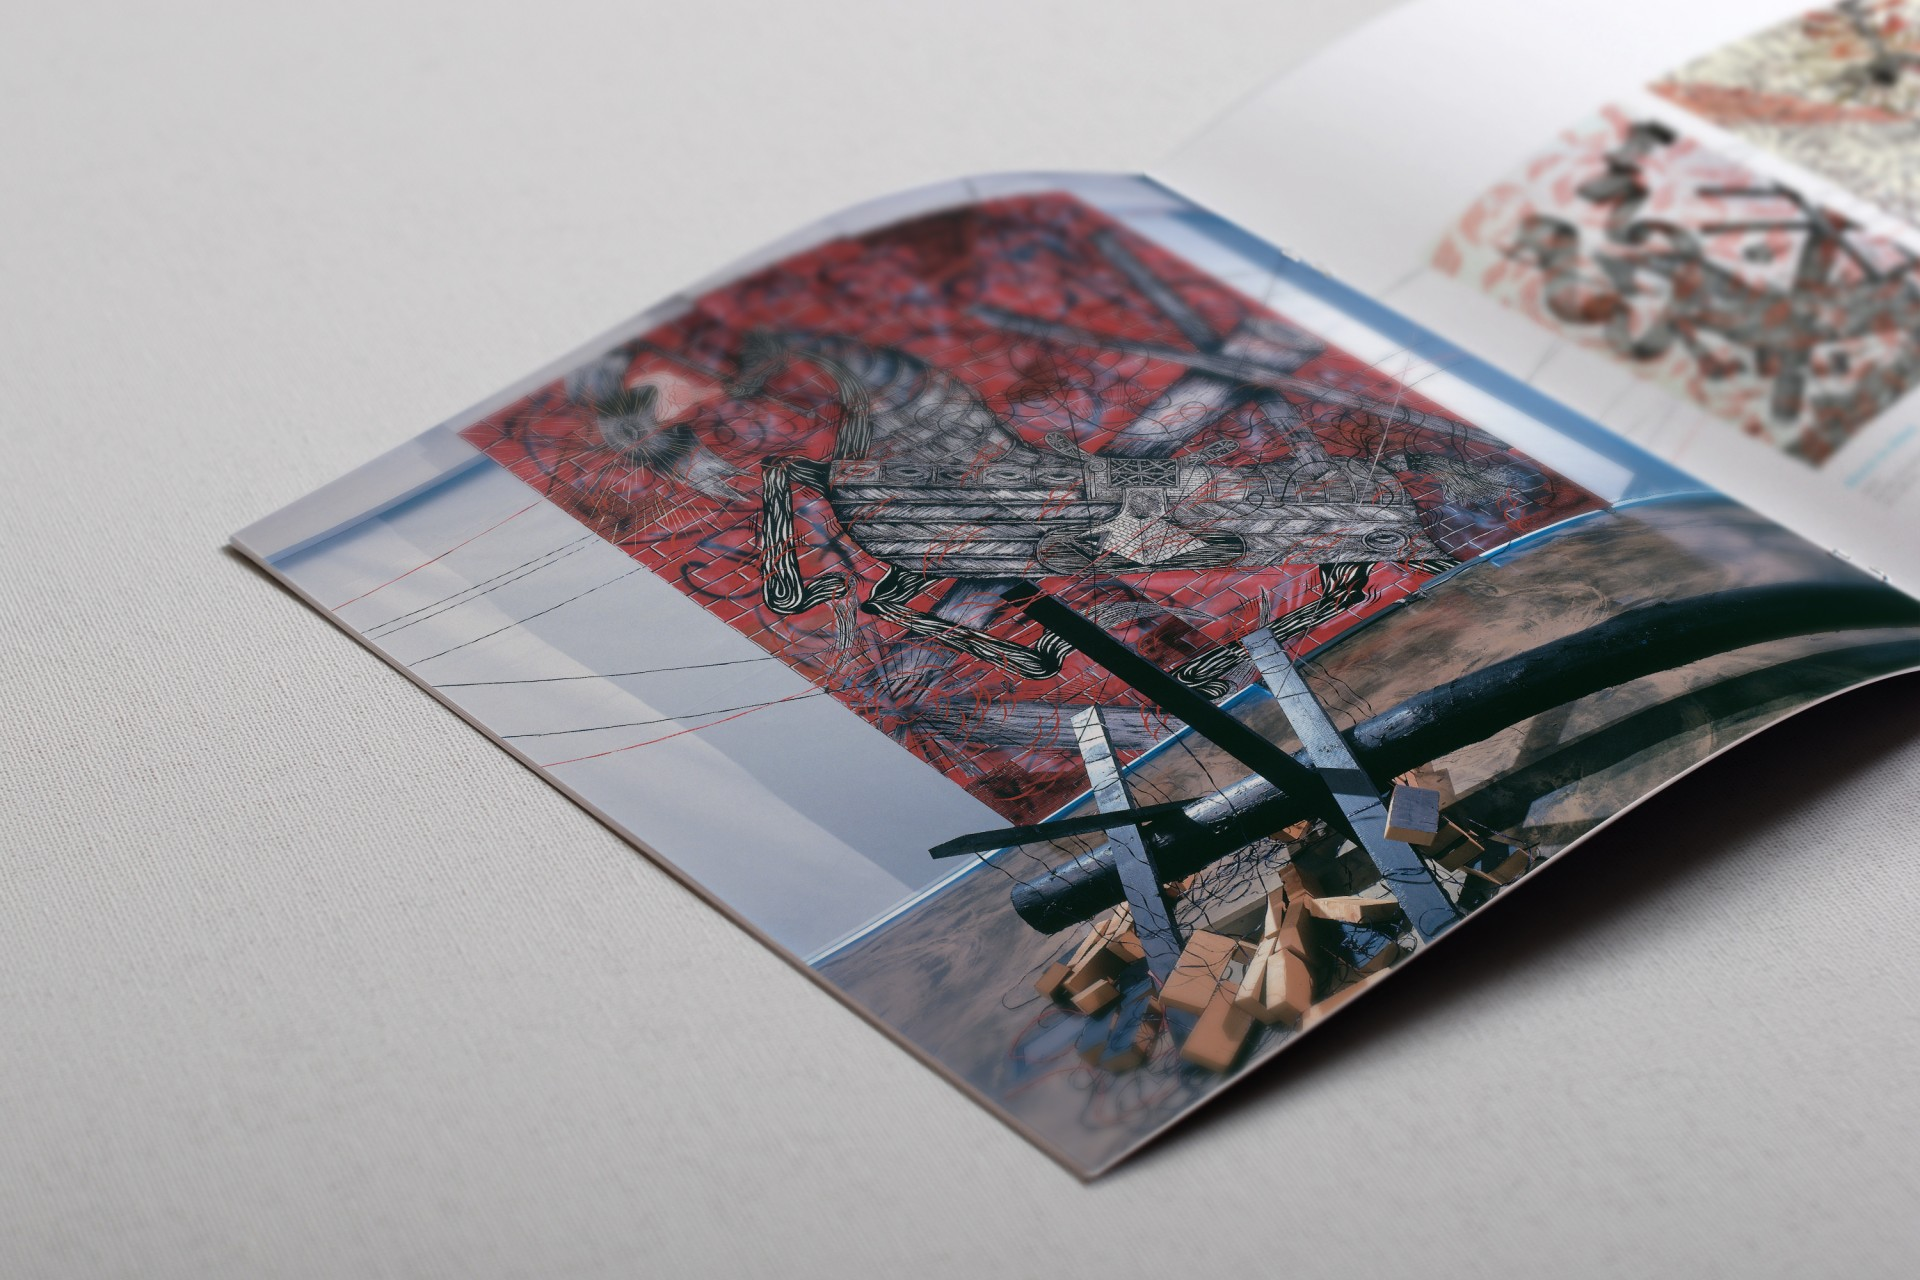 Andrew Shoultz - Crisis - Catalogo artista - dettaglio